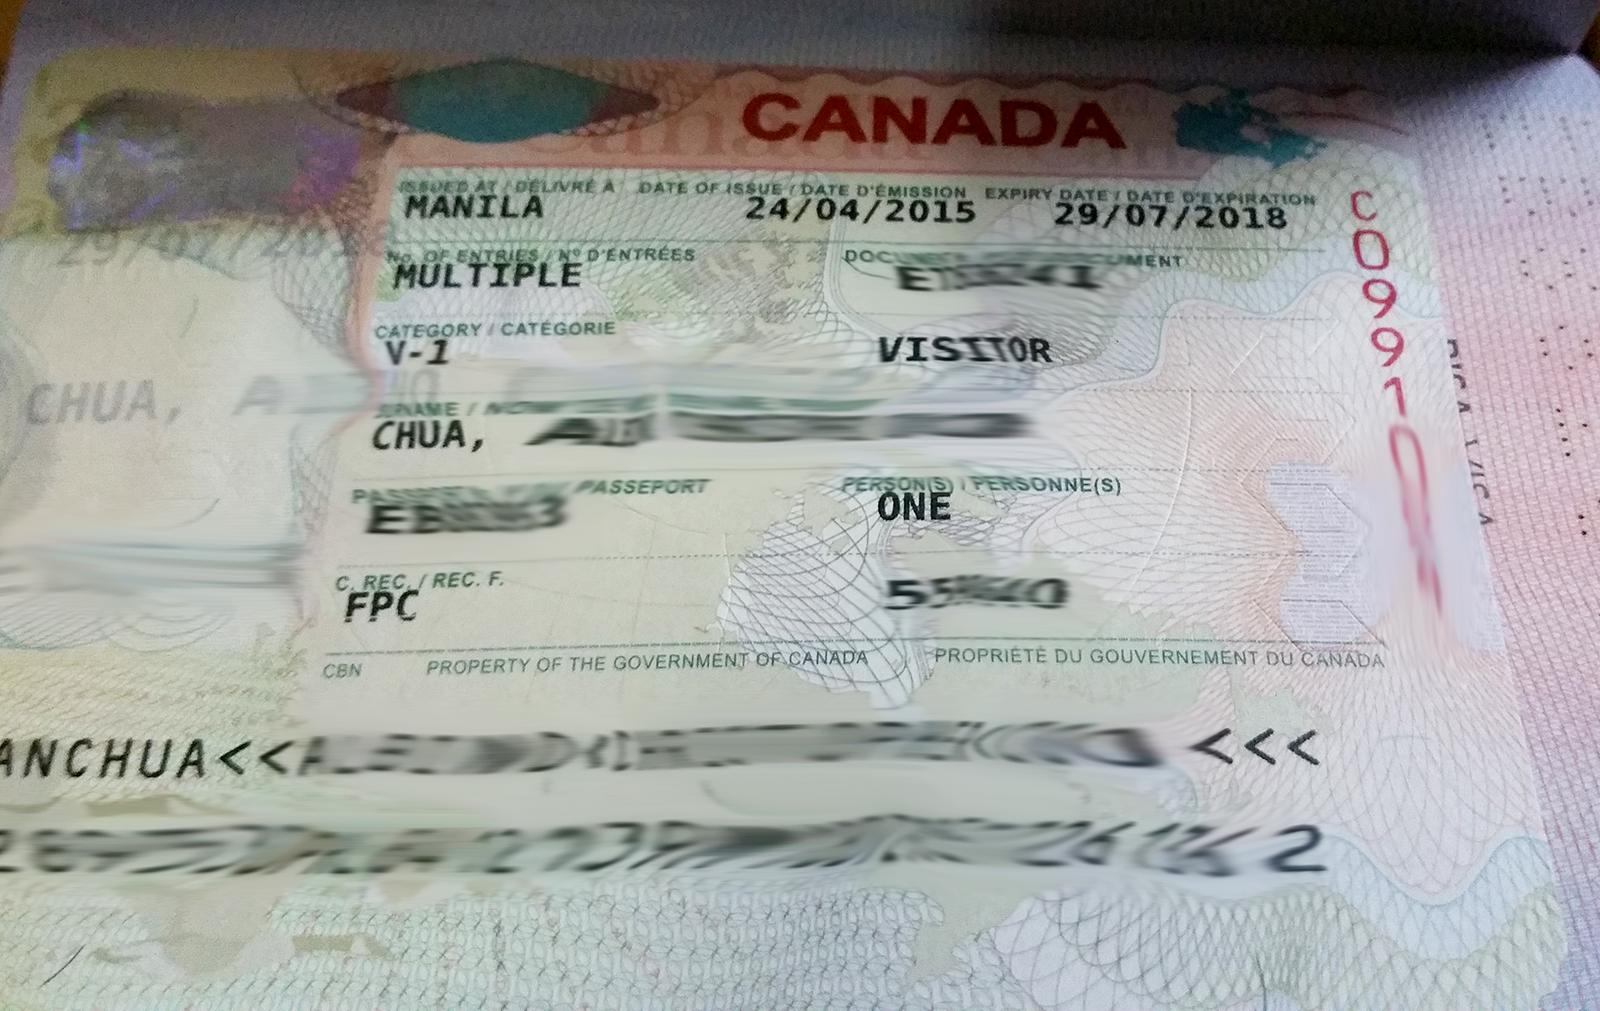 20150604210307 How to Get a Canada Tourist